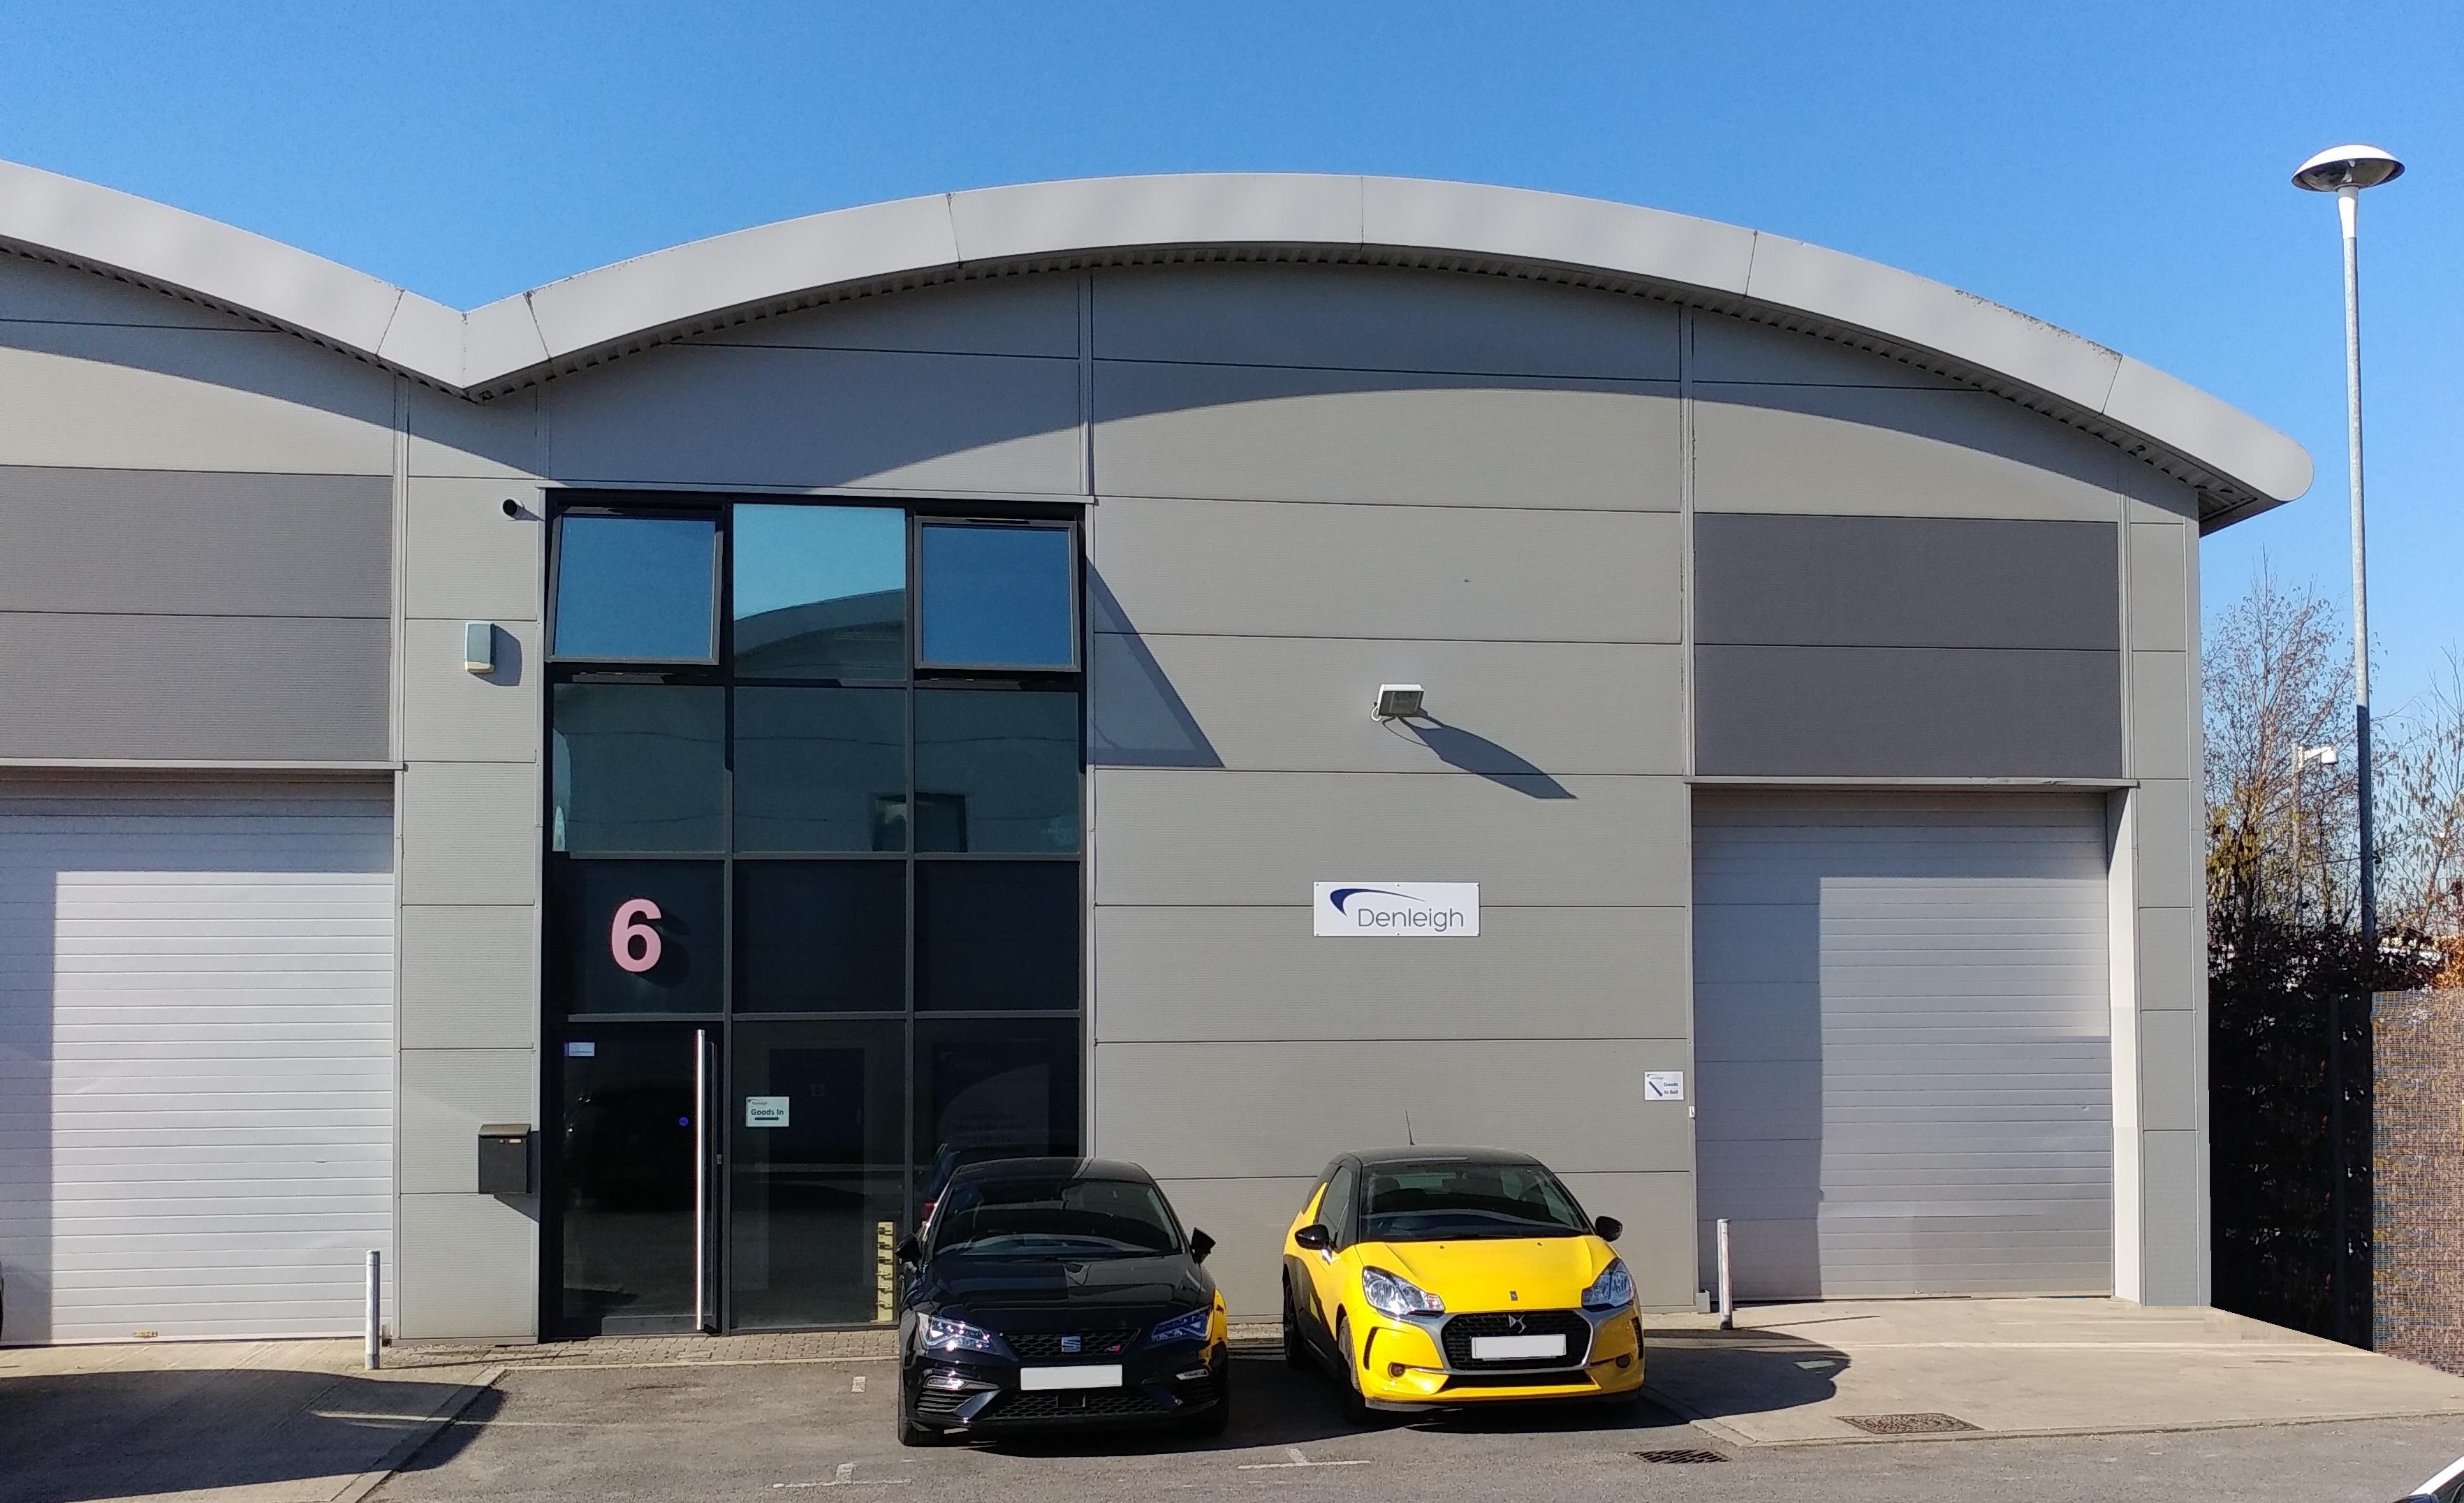 Denleigh opens the door to new offices in Amesbury